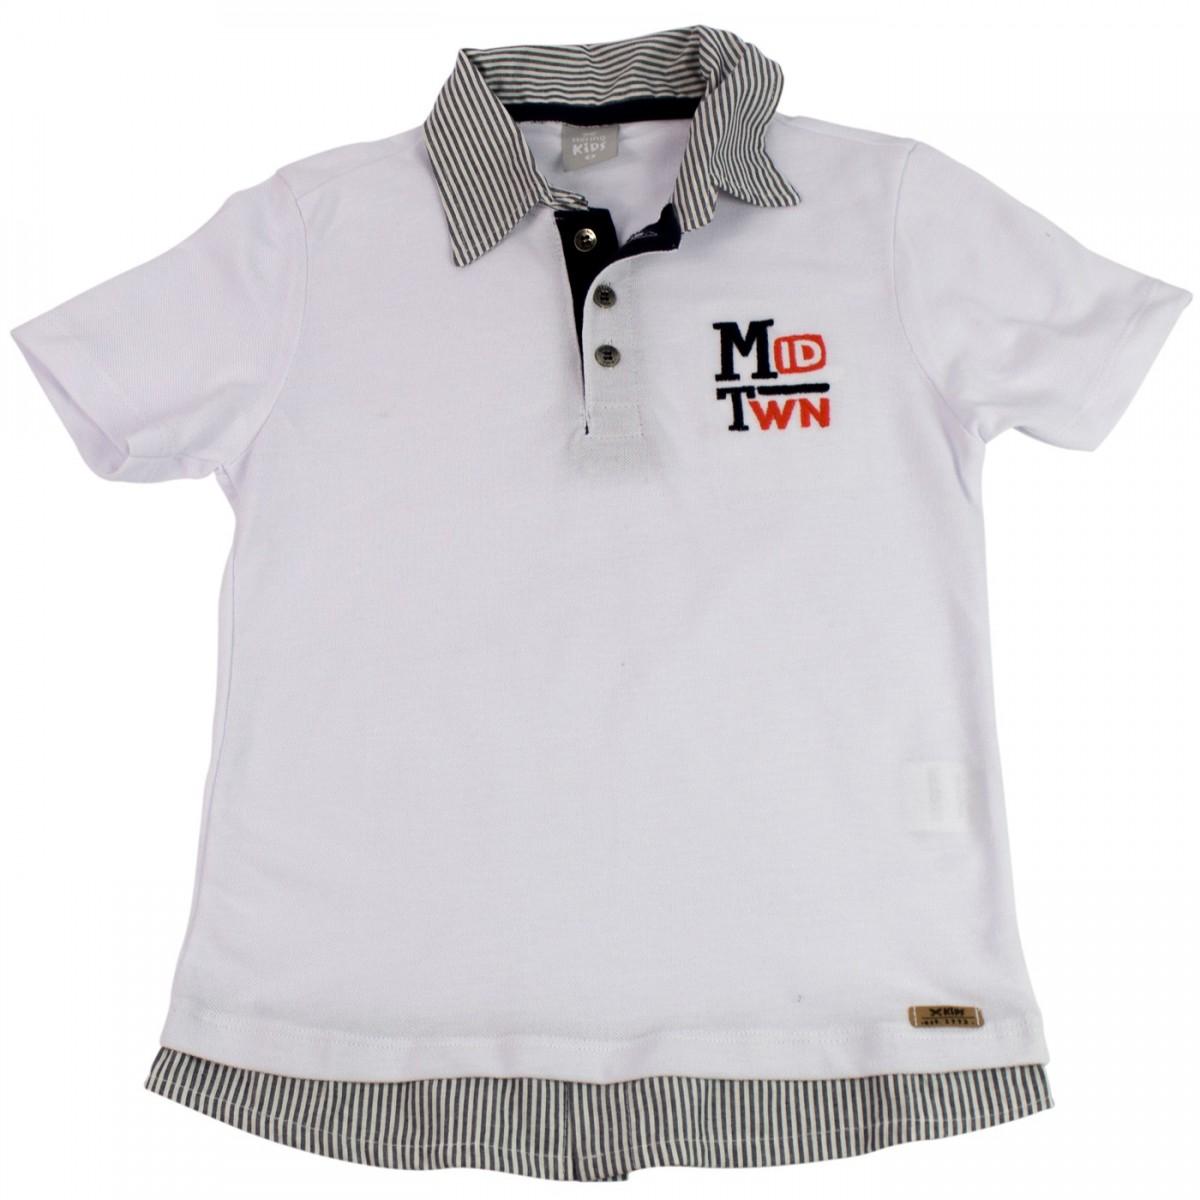 6bb87e7ba Bizz Store - Camisa Polo Infantil Masculina Hering Kids Marinho